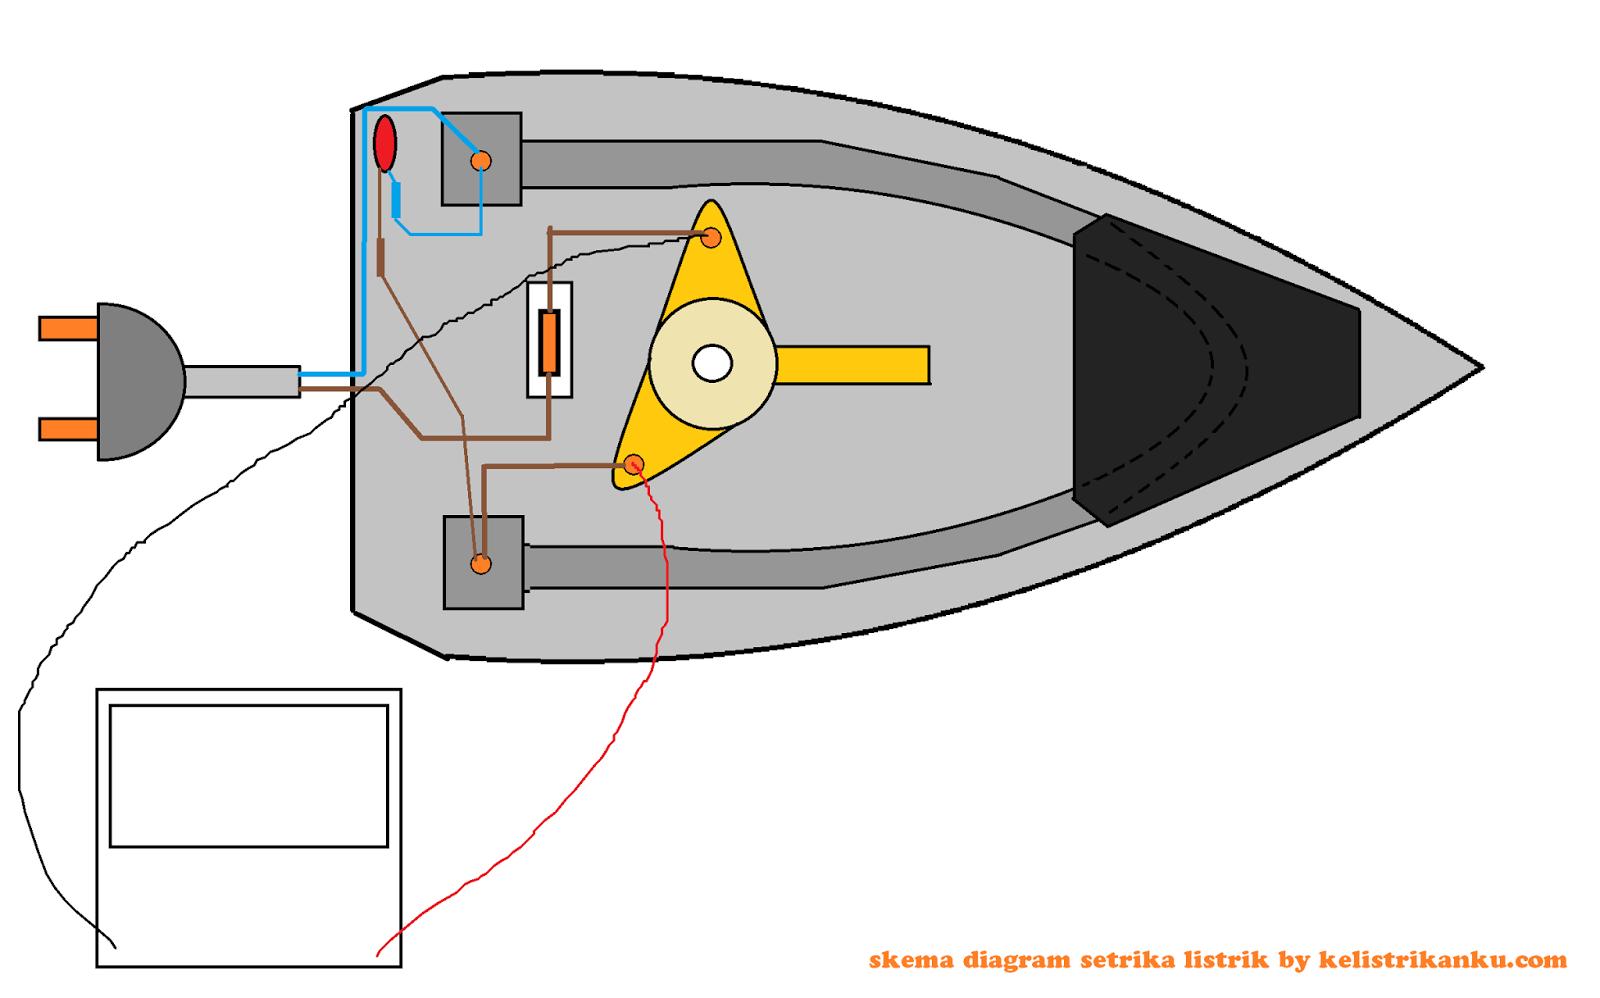 Wiring Diagram Setrika Listrik : Ford f ke wiring diagram mitsubishi galant